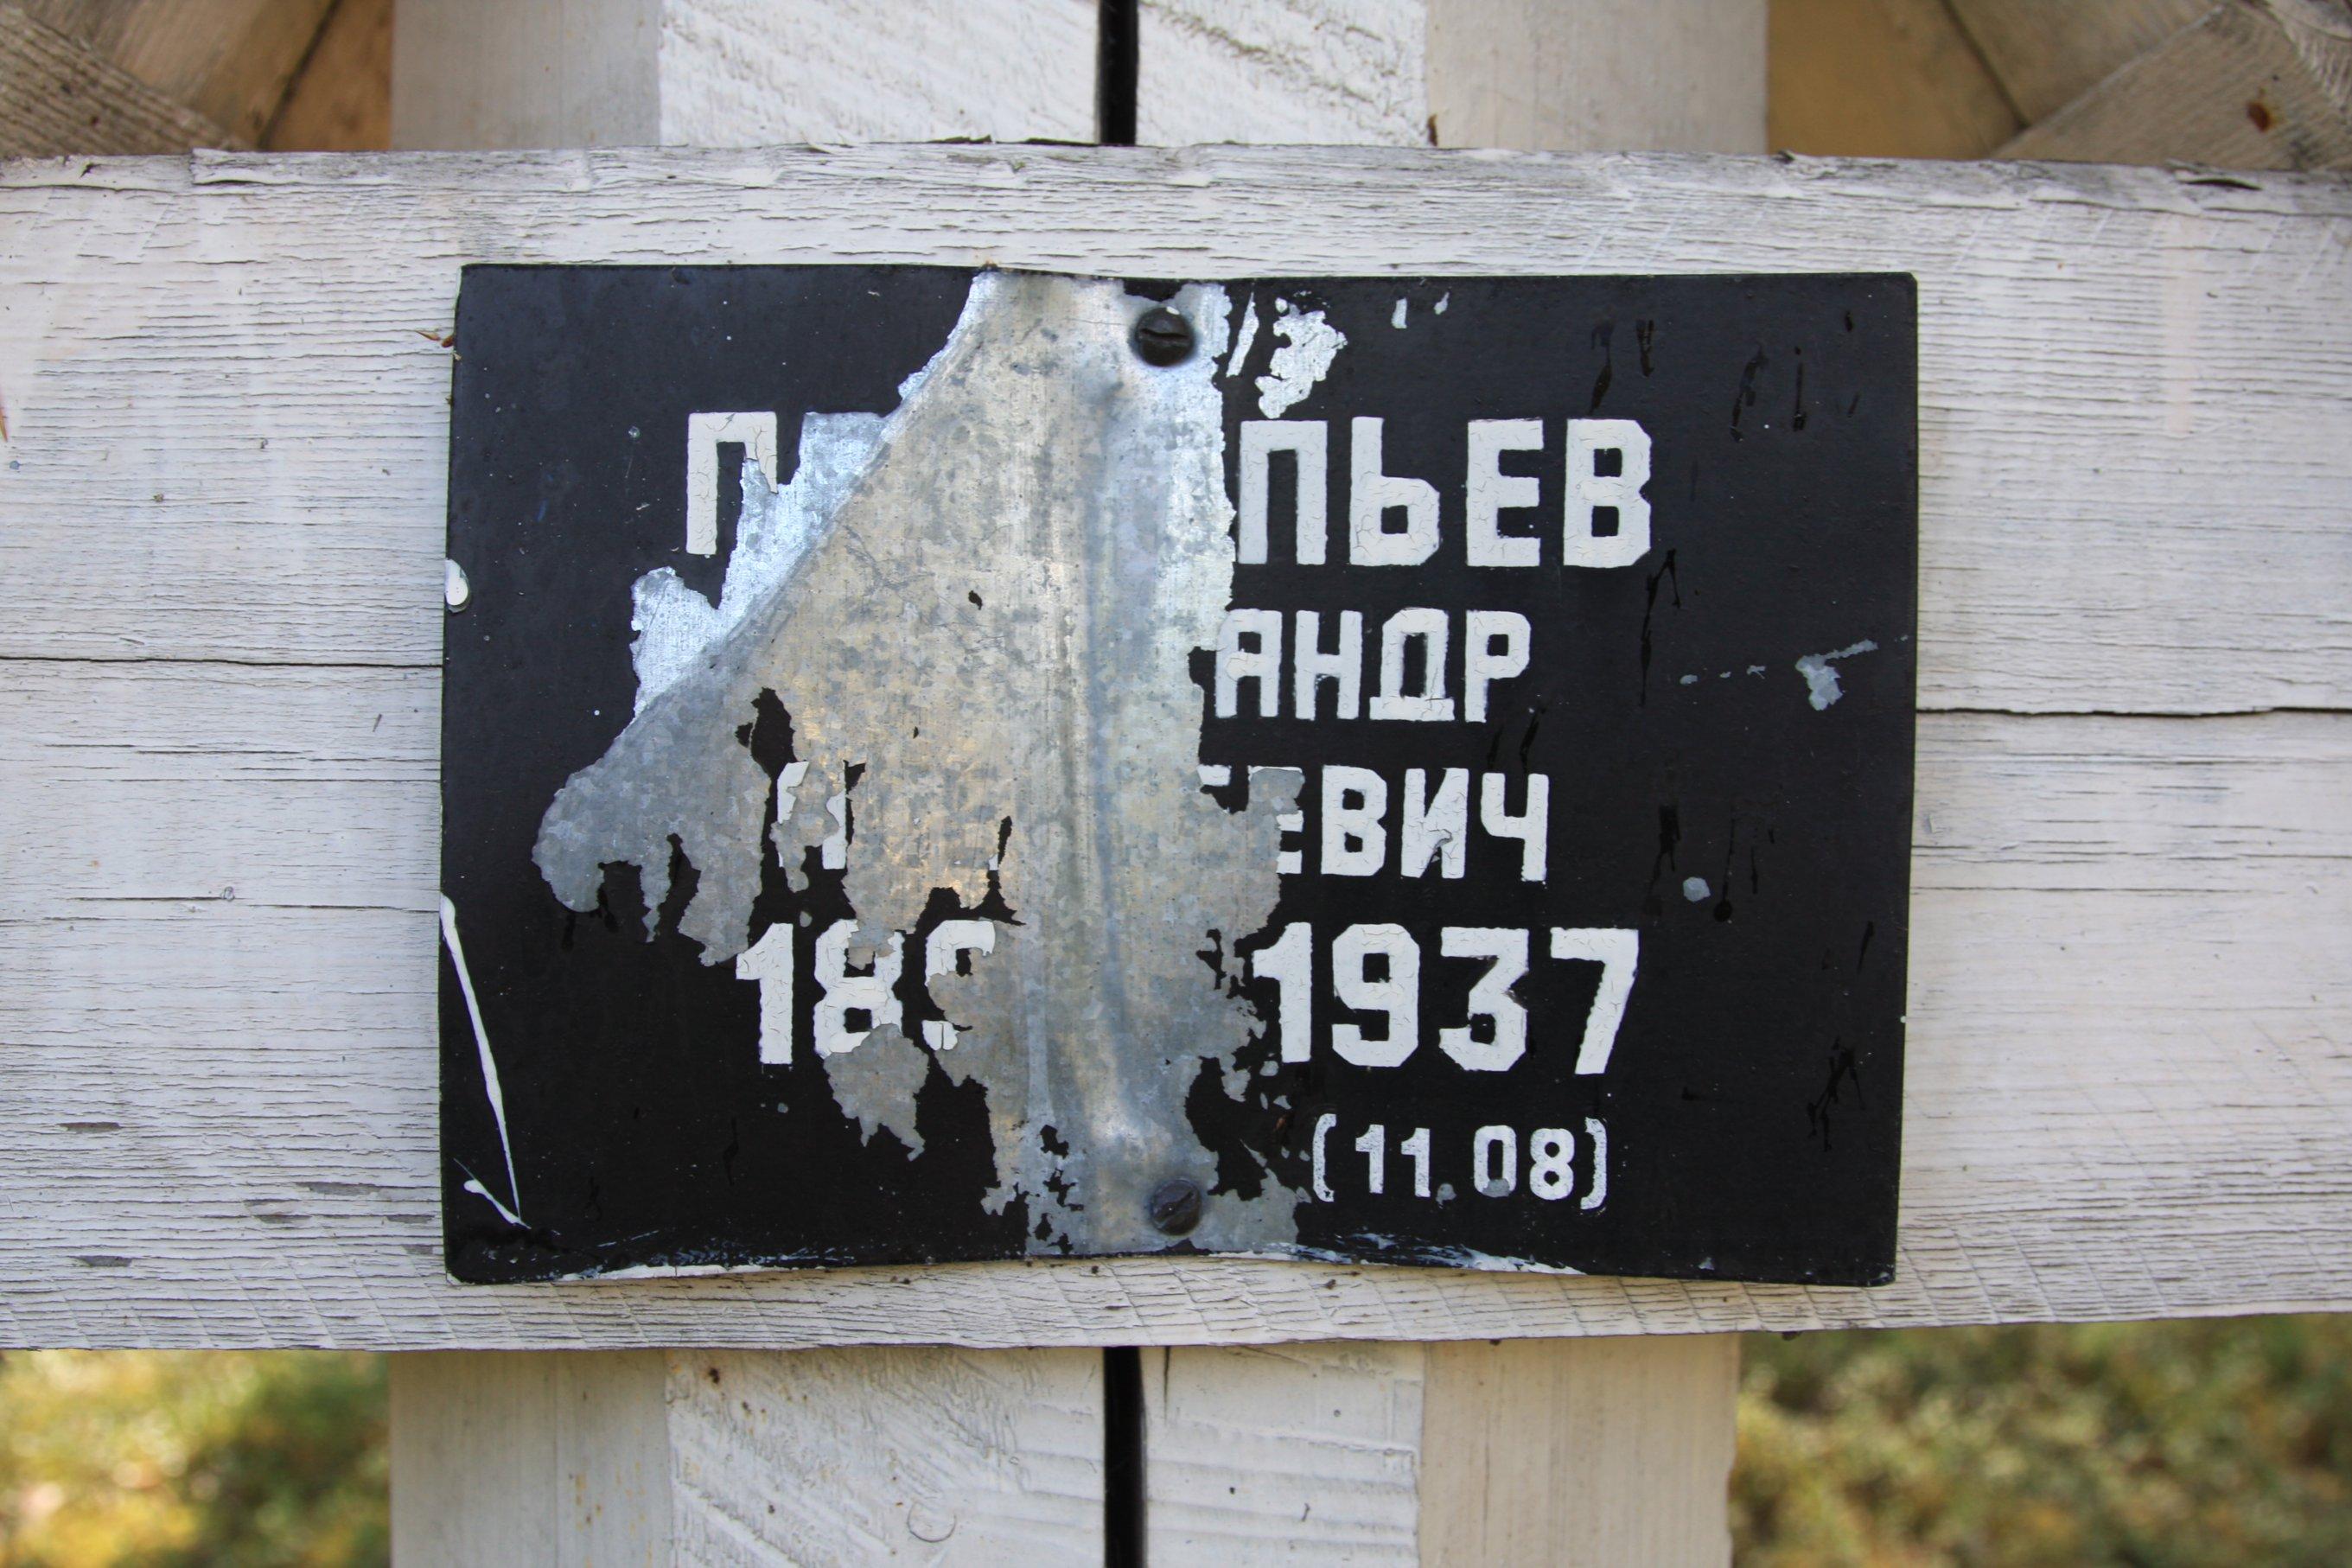 Памятная табличка «Прокопьев Александр Алексеевич». Фото 04.08.2018.